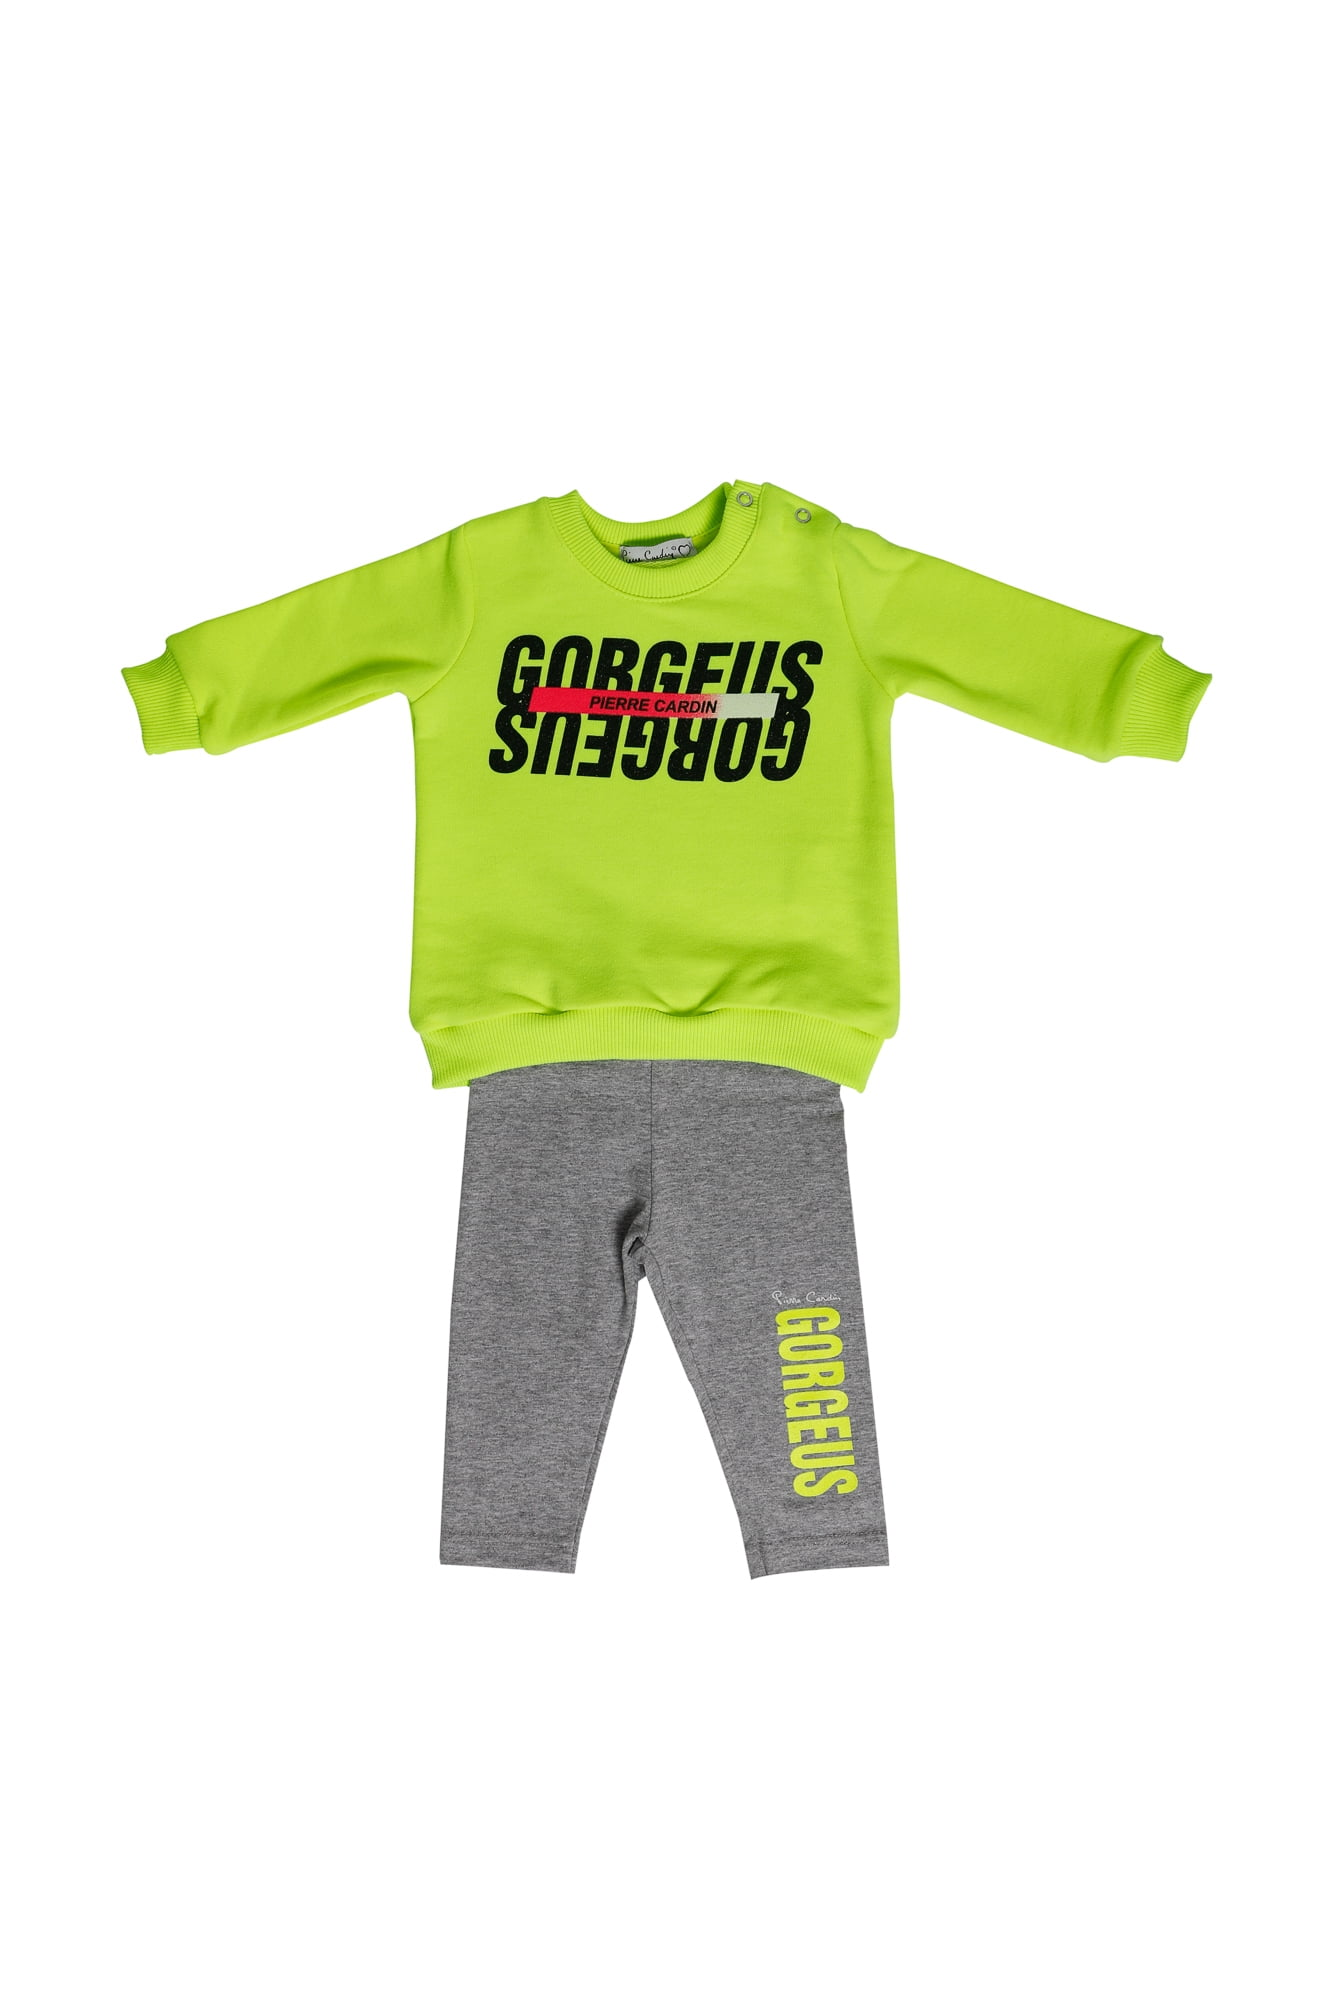 Completo neonata Pierre Cardin giallo fluo felpa girocollo - Leggings grigo